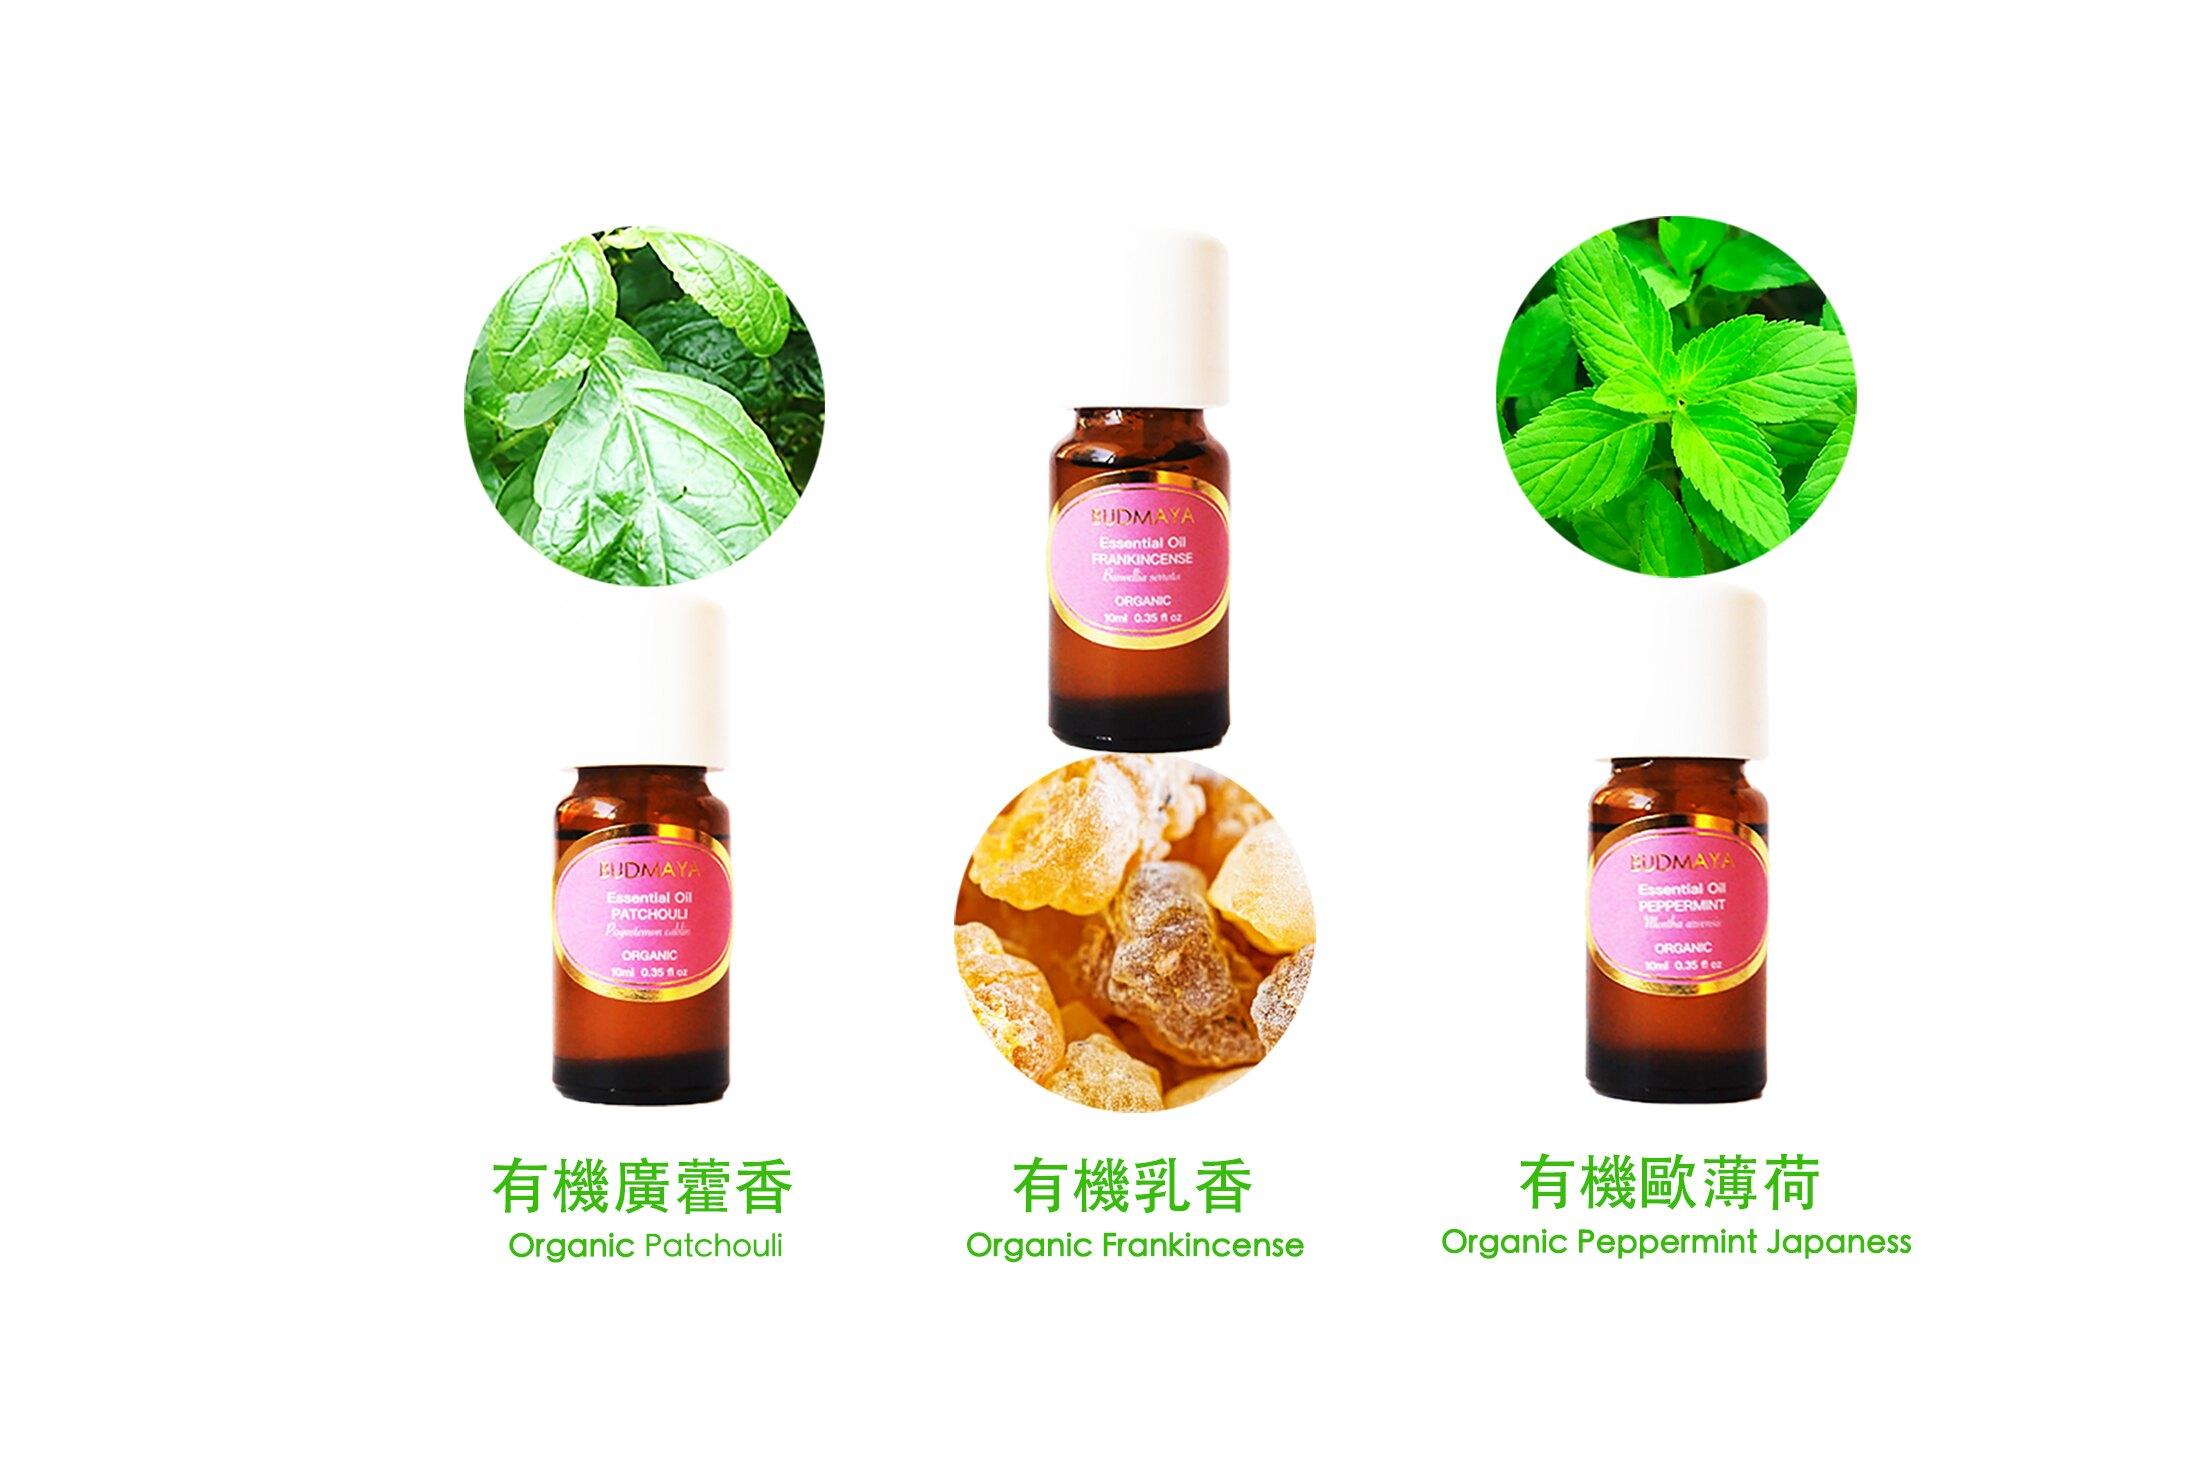 BUDMAYA OM系列有機精油香氛禮盒 - C SET (6入裝)有機乳香/有機廣藿香/有機歐薄荷  美國有機USDA認證  免運